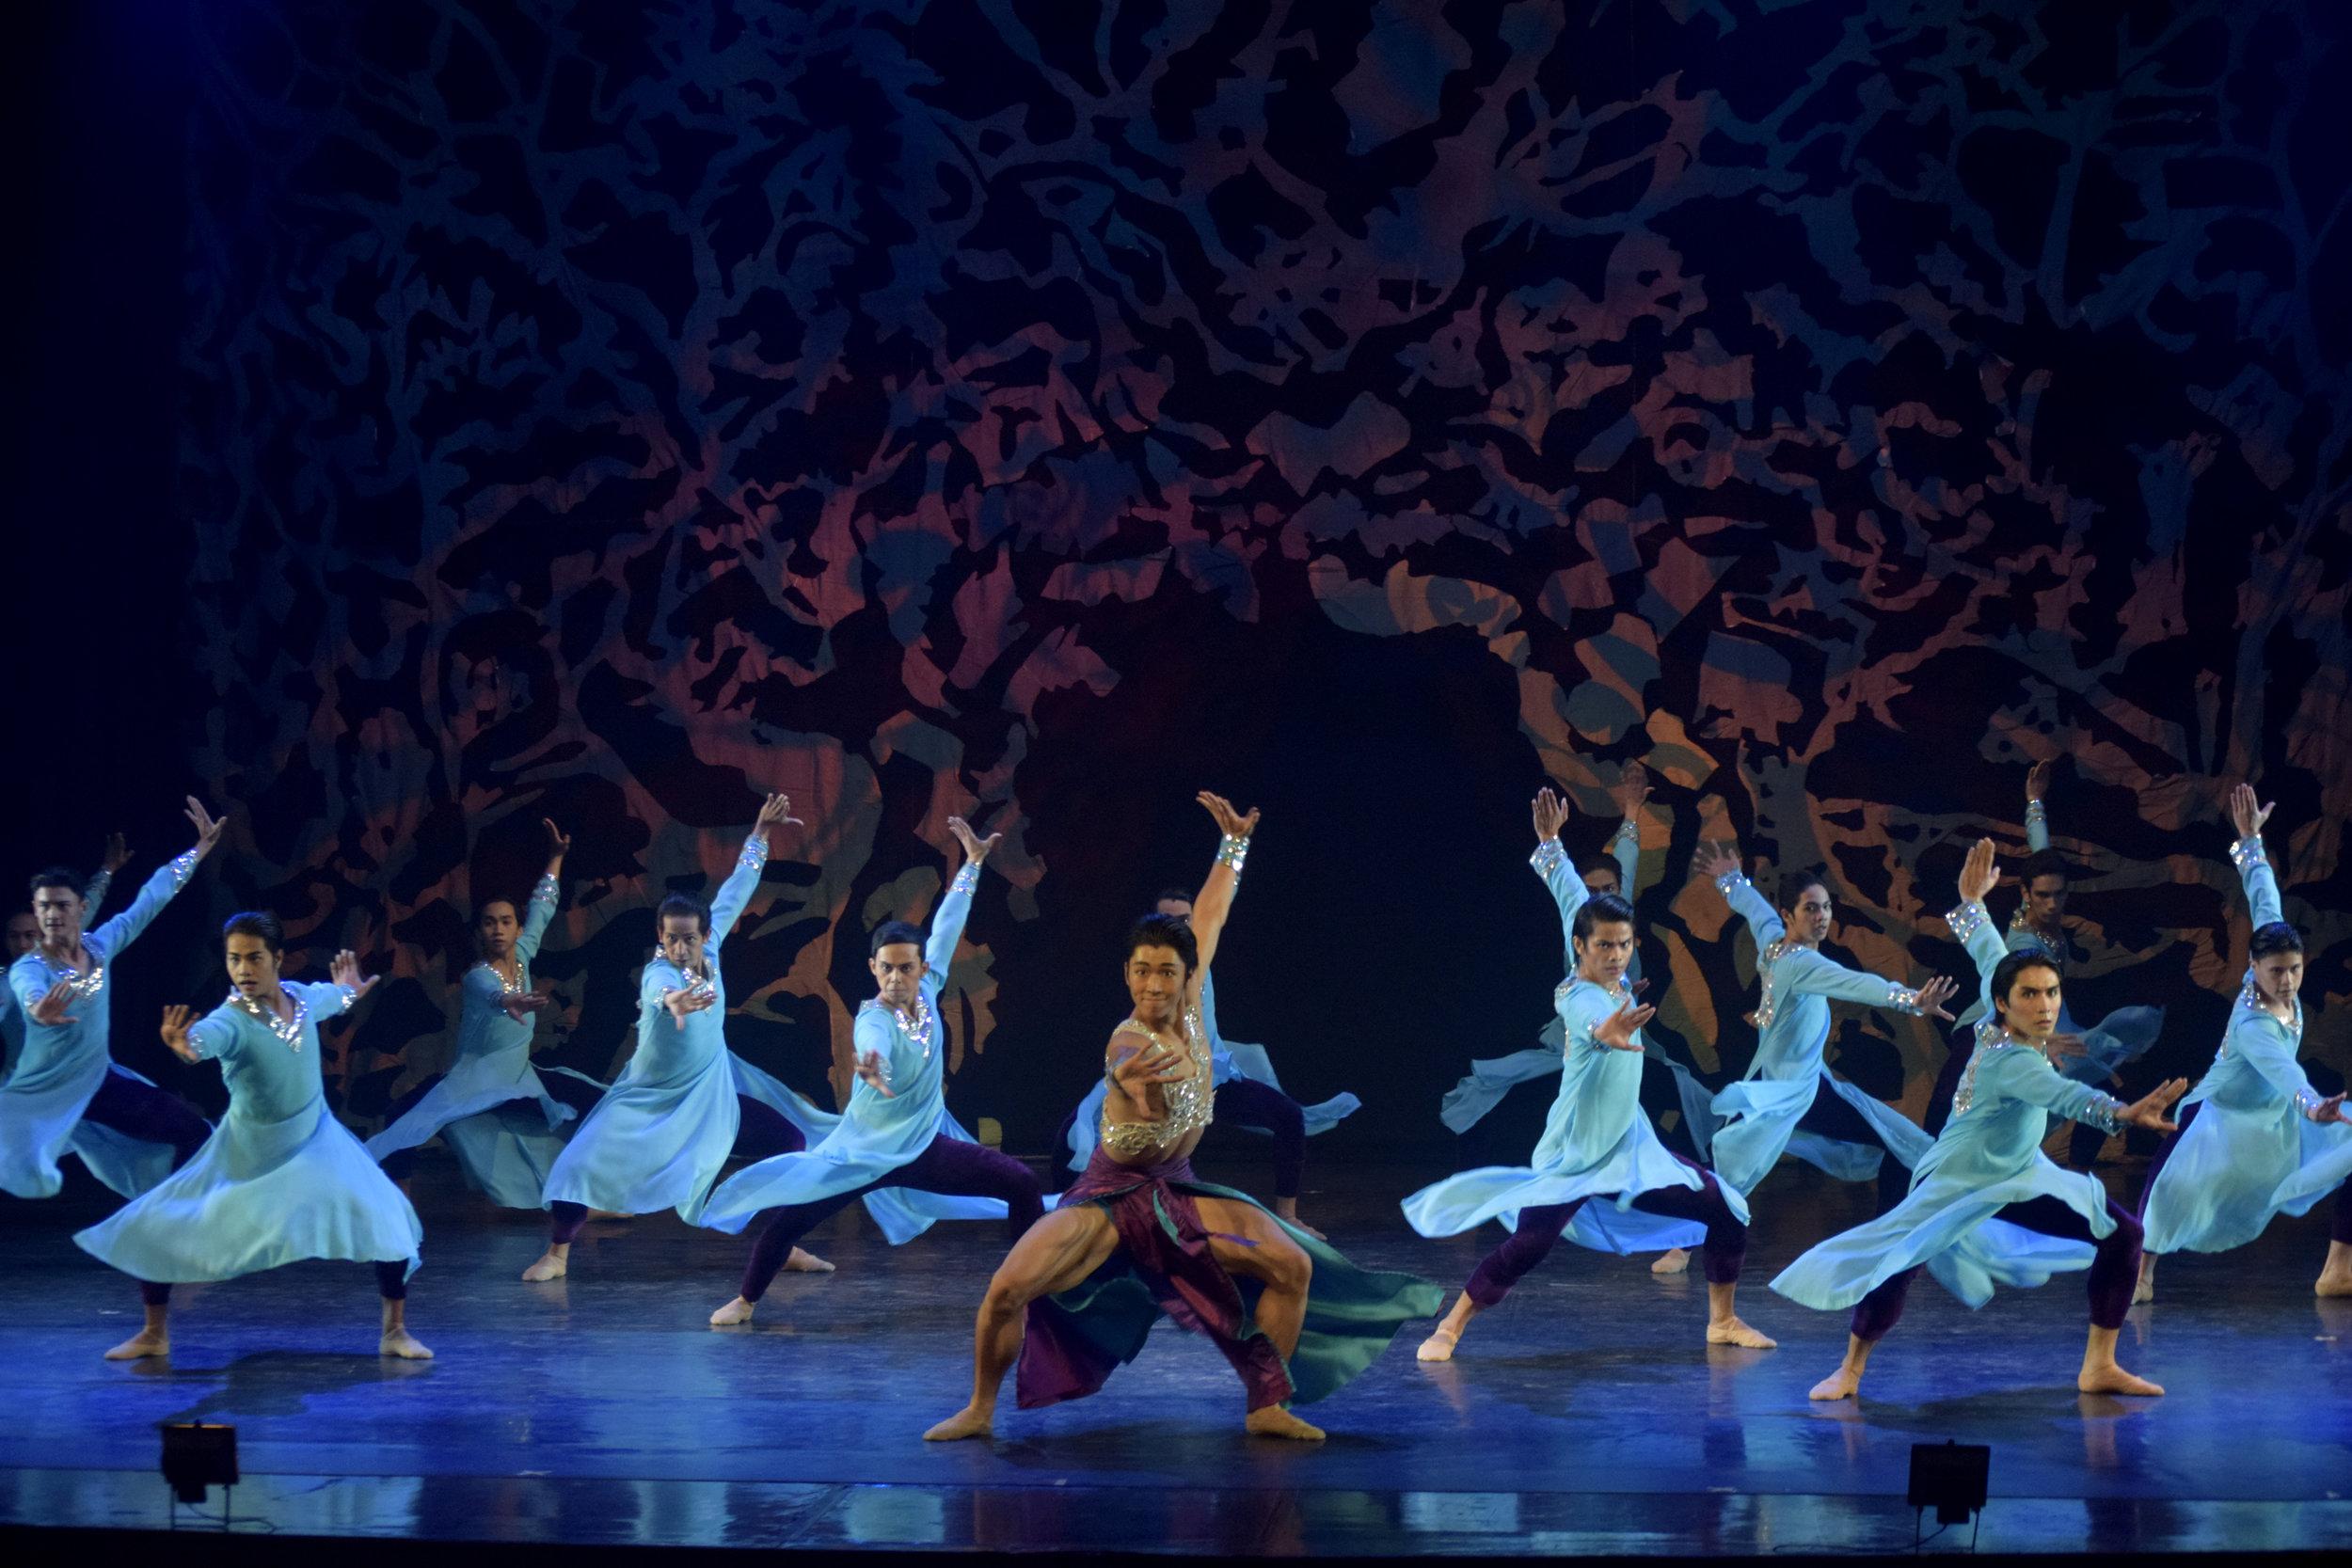 Hyuma Kiyosawa dances the lead in Bam Damian's all-male choreography  Aramica  which was featured in  Deux , Ballet Manila's 23rd season-ender. Photo by Erickson Dela Cruz